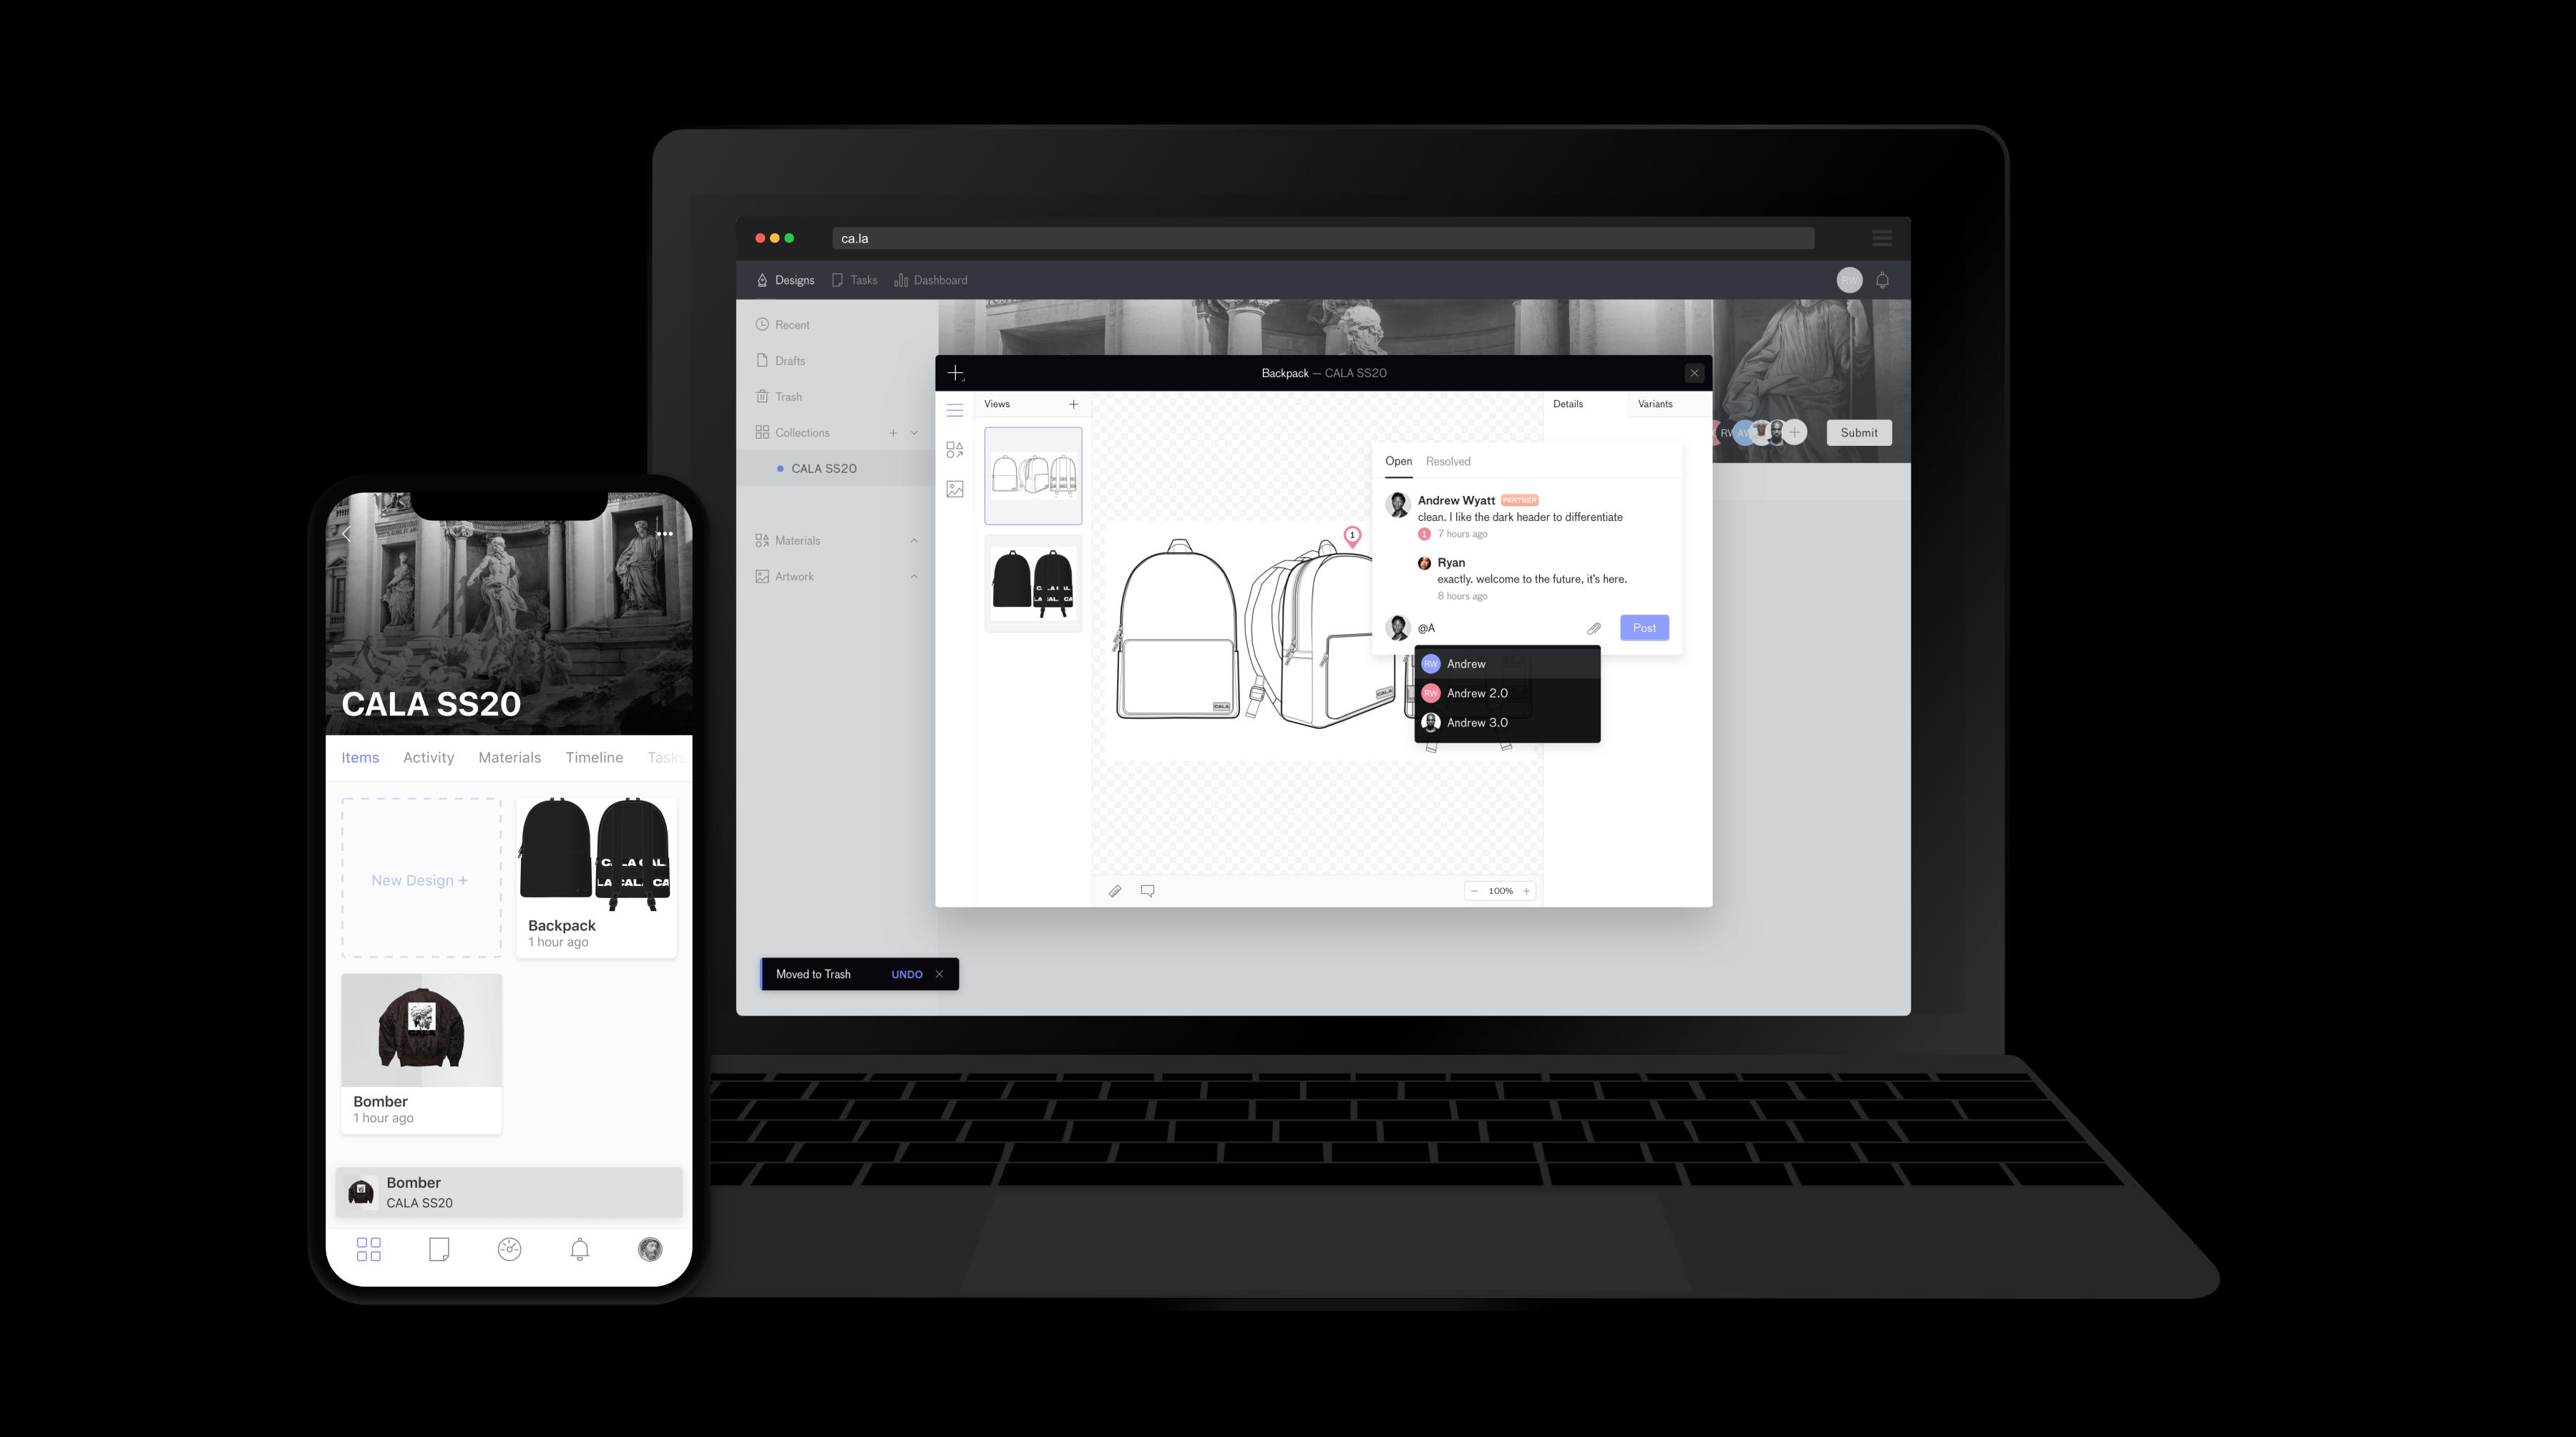 Supply chain platform Cala's user interface   Source: Courtesy